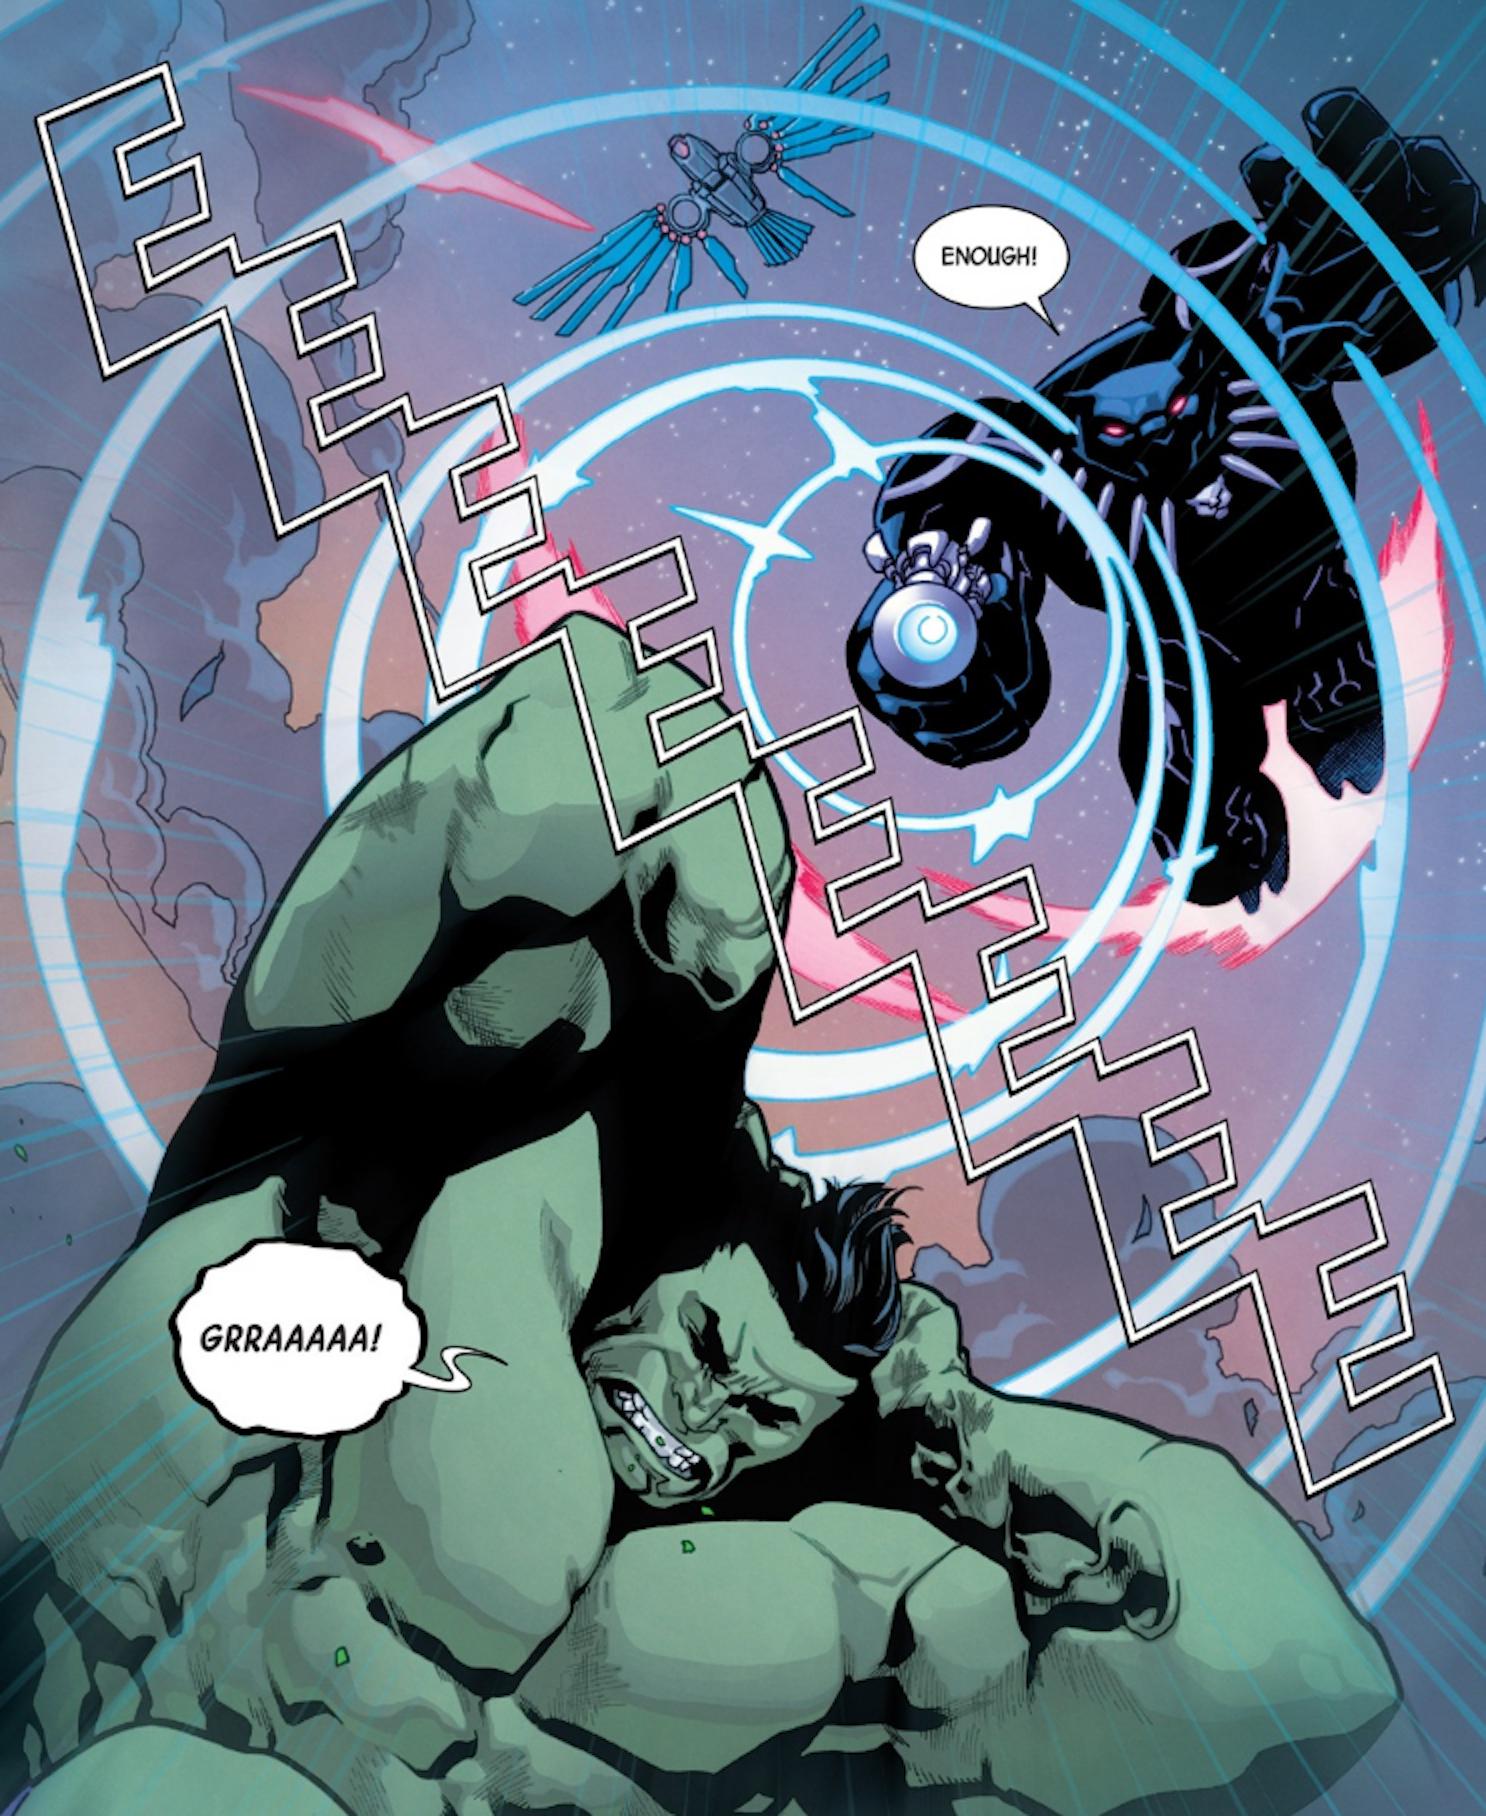 Hulk vs Black Panther